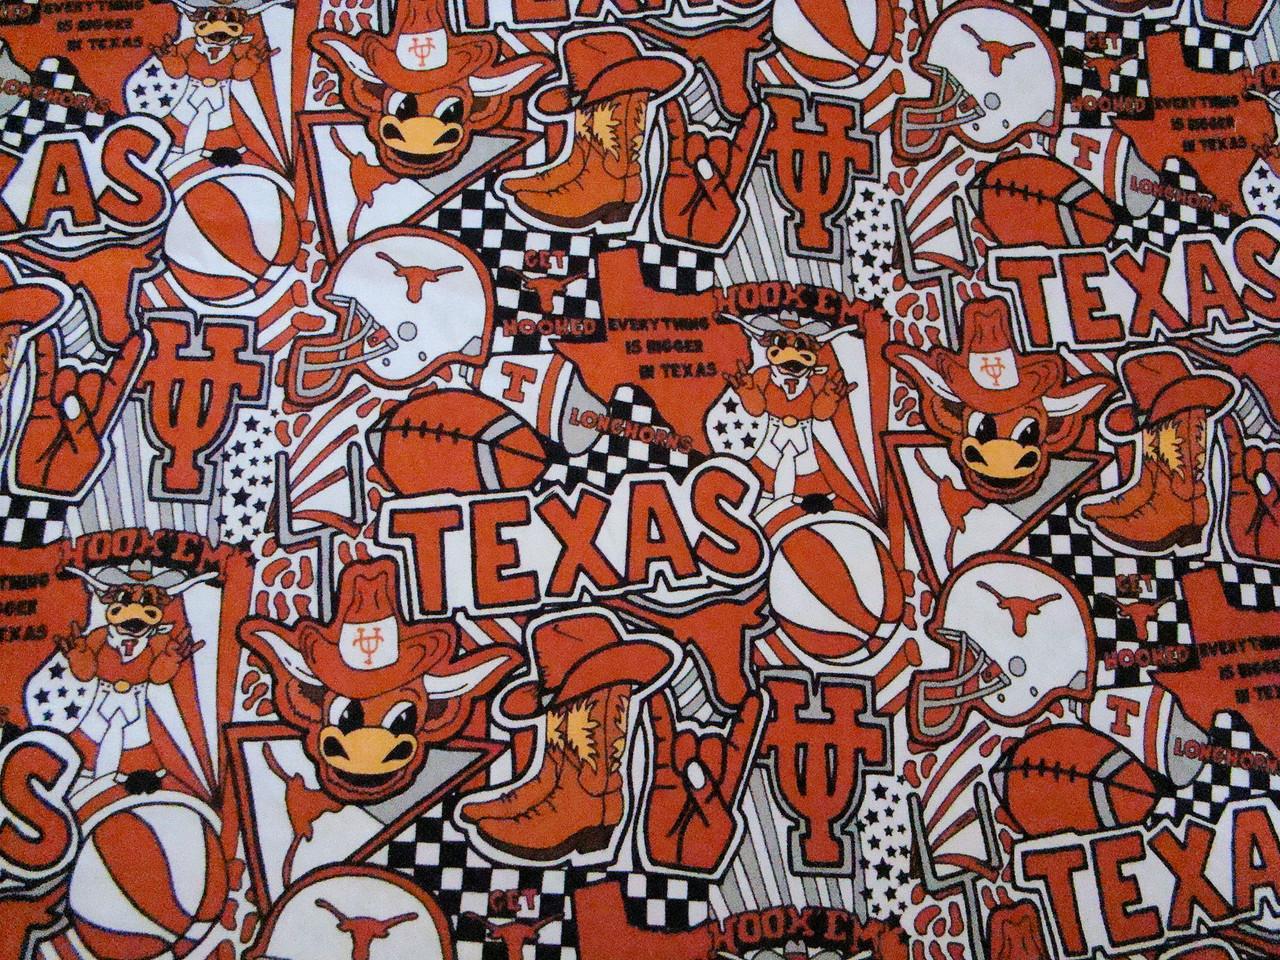 University of Texas Pop Art